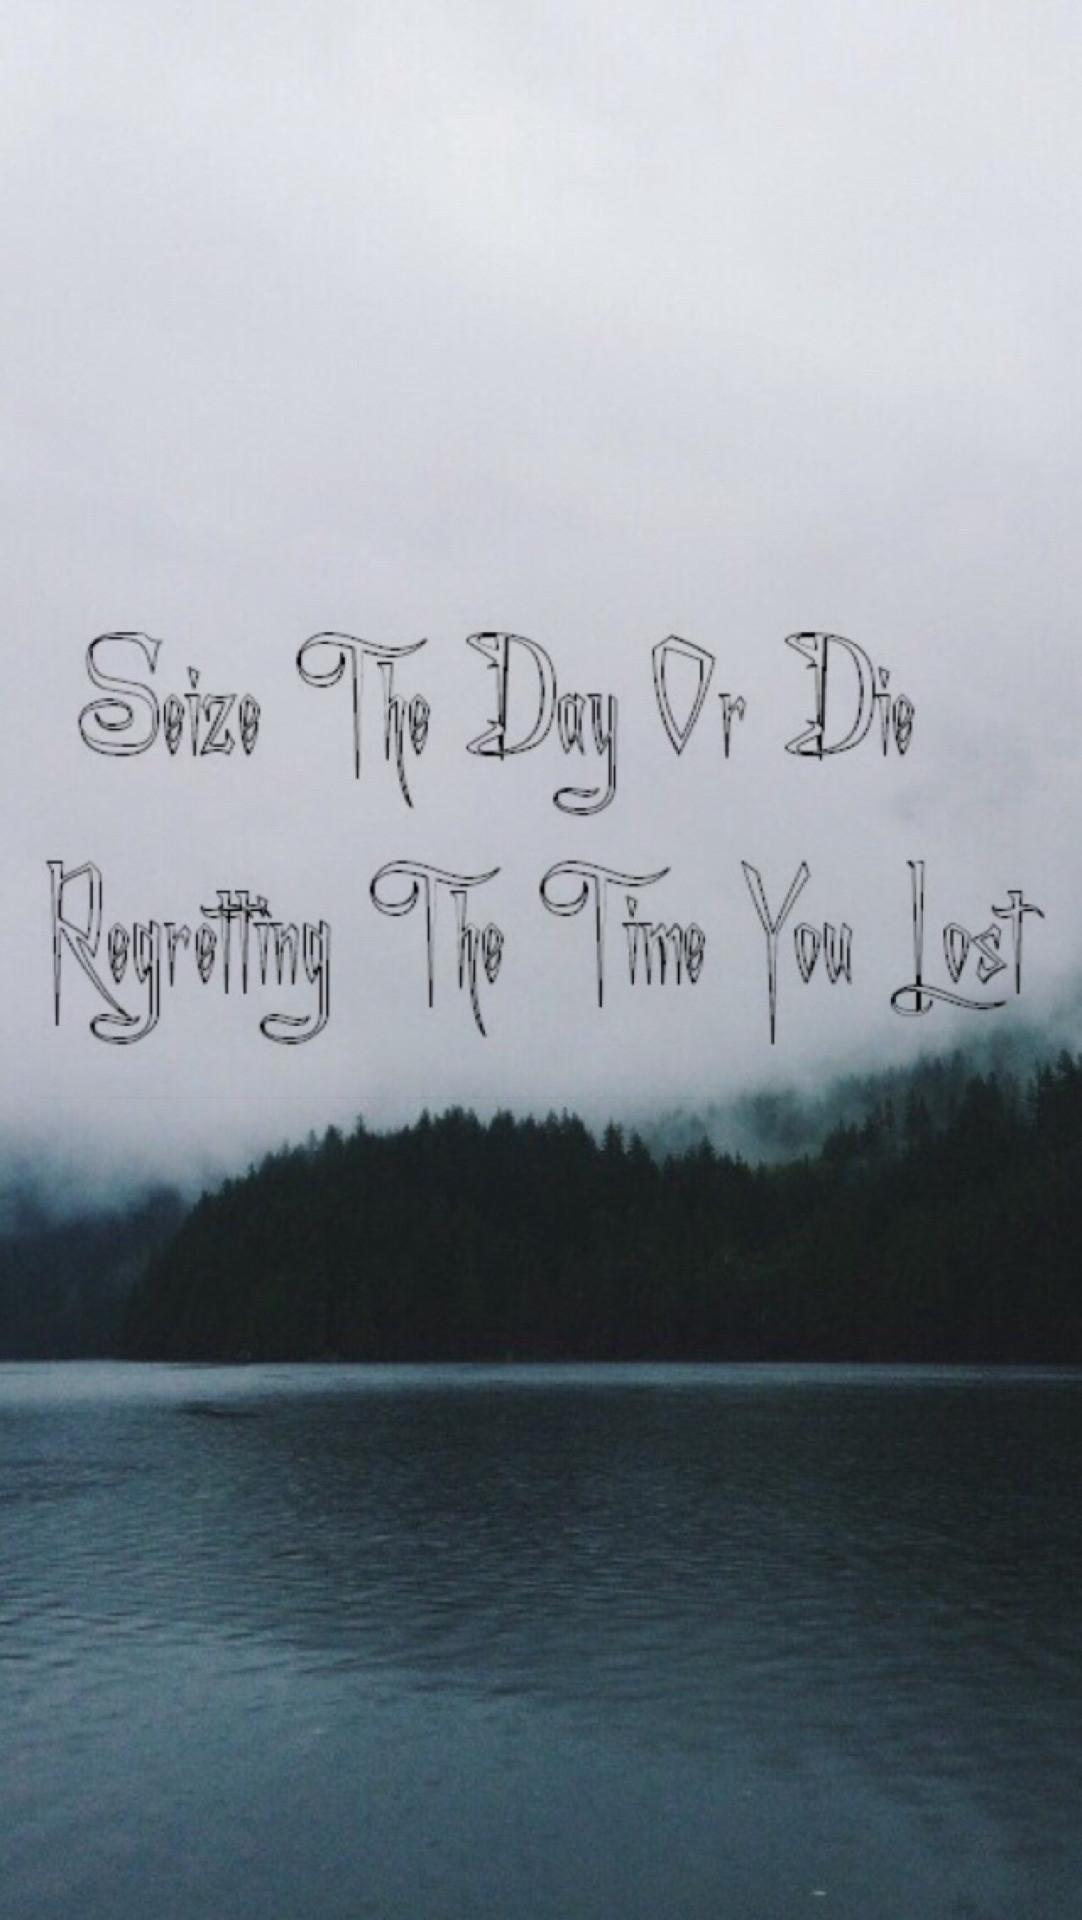 pretty epic deathbat wallpaper, picture found on tumblr: hqlockscreens ·  Wallpaper PicturesAvenged SevenfoldOn …